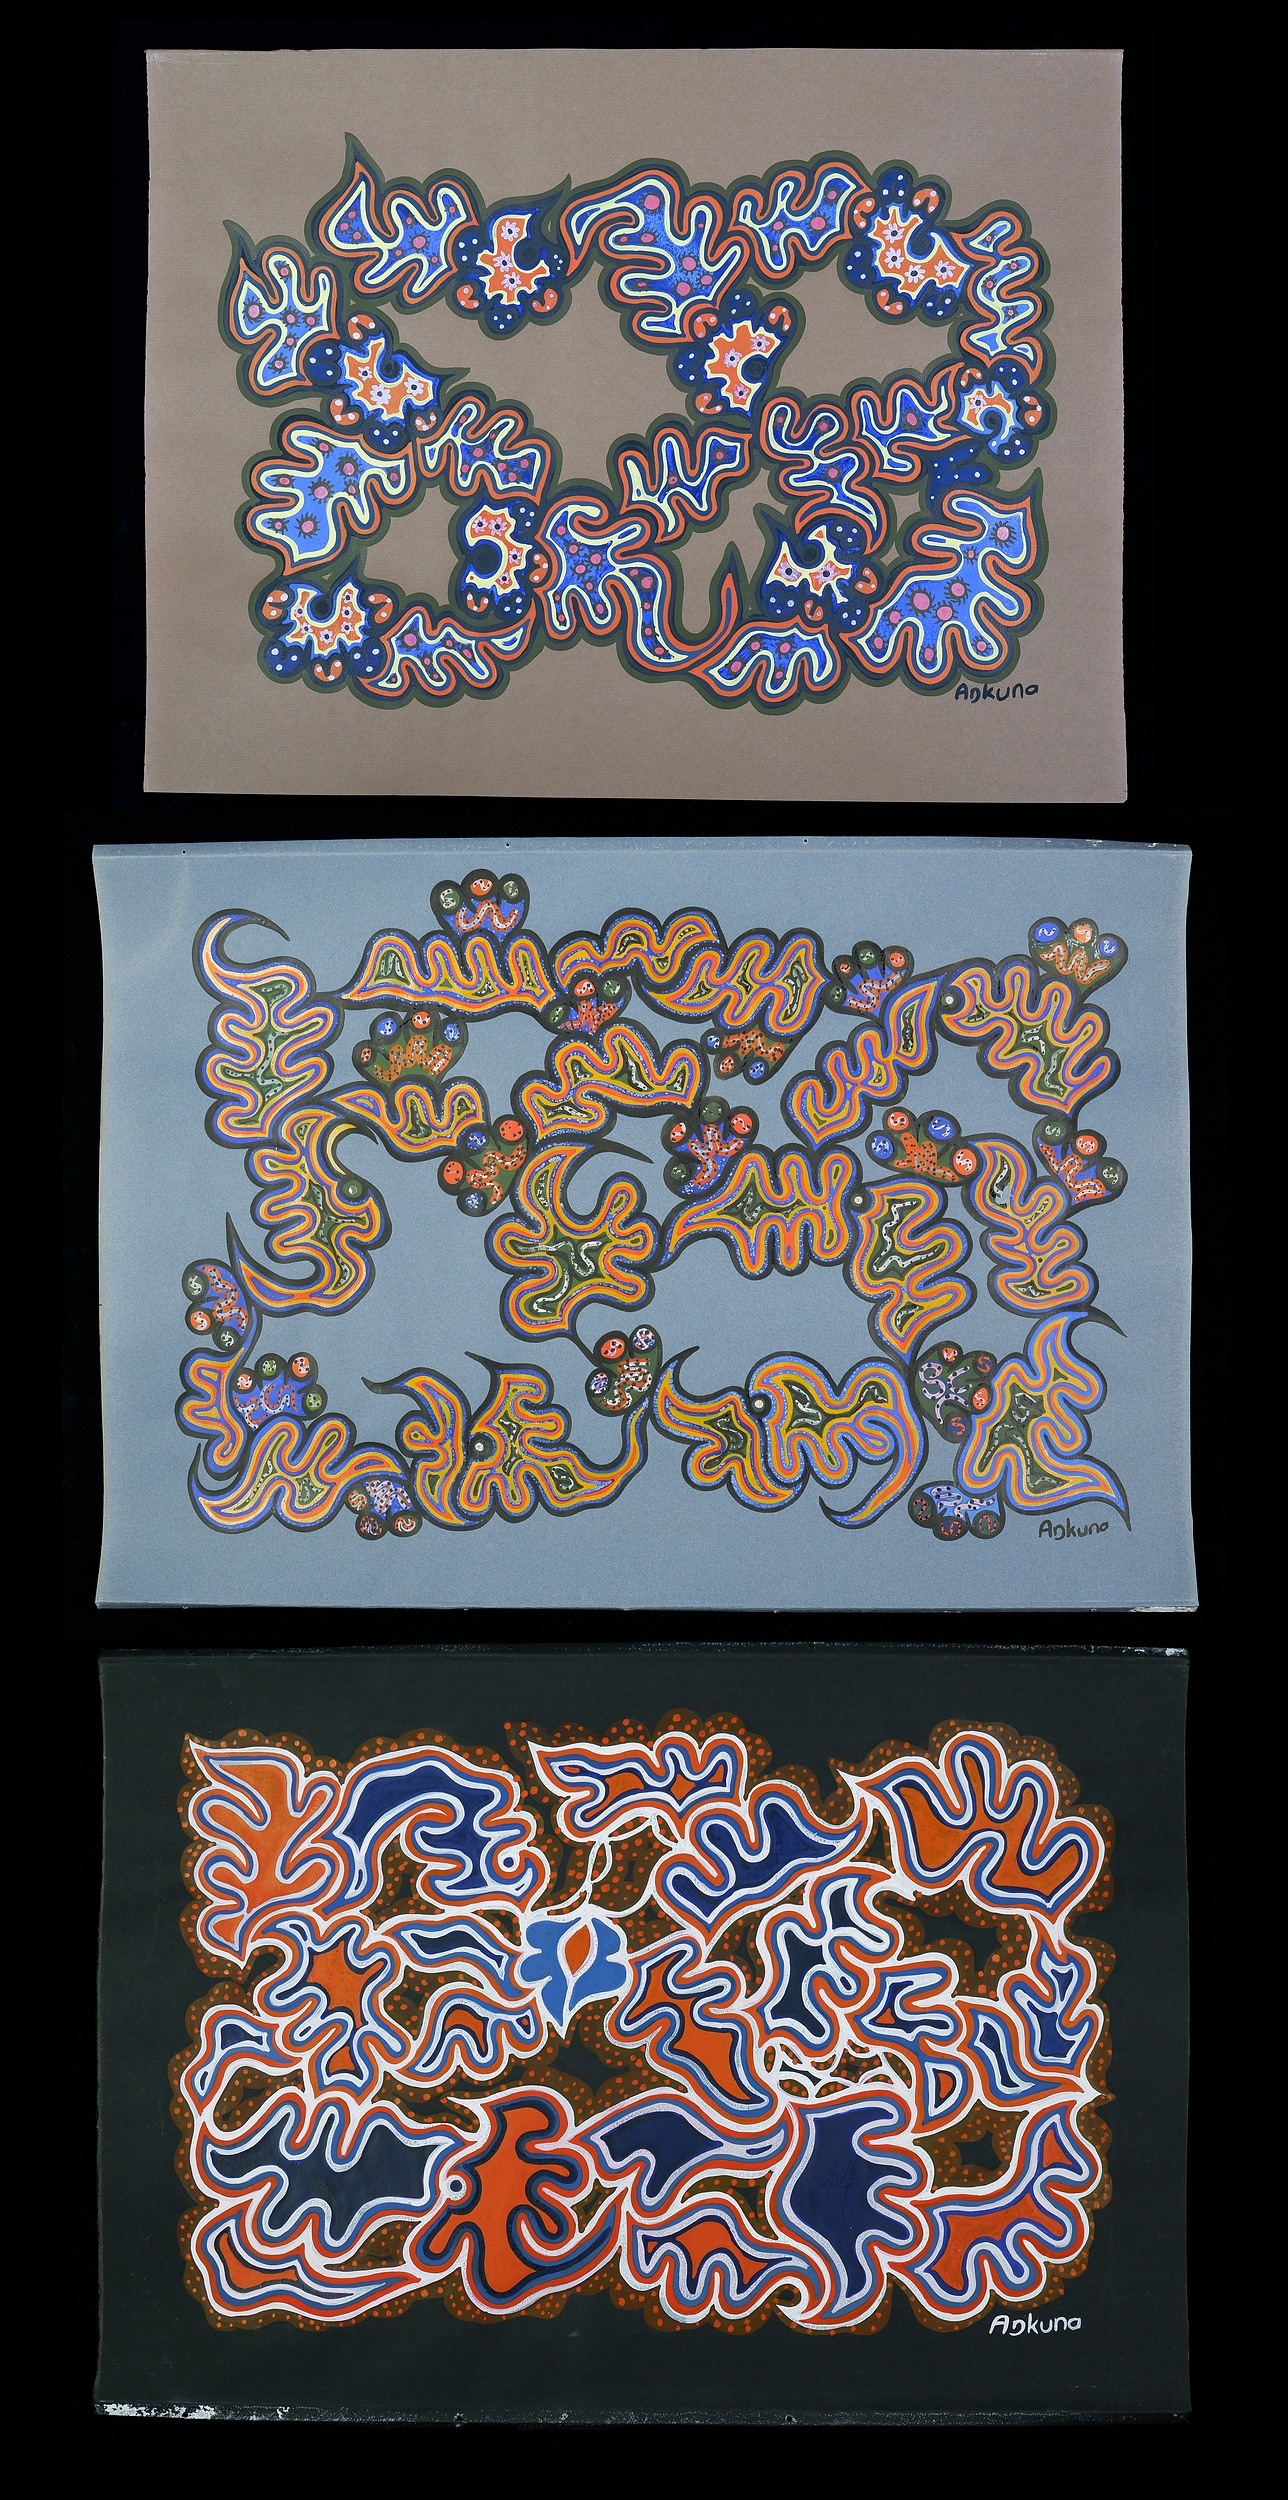 'Adkuna (working late 1960s, Pitjantjatjara language group), Three Untitled Works, Gouache on Paper (3)'